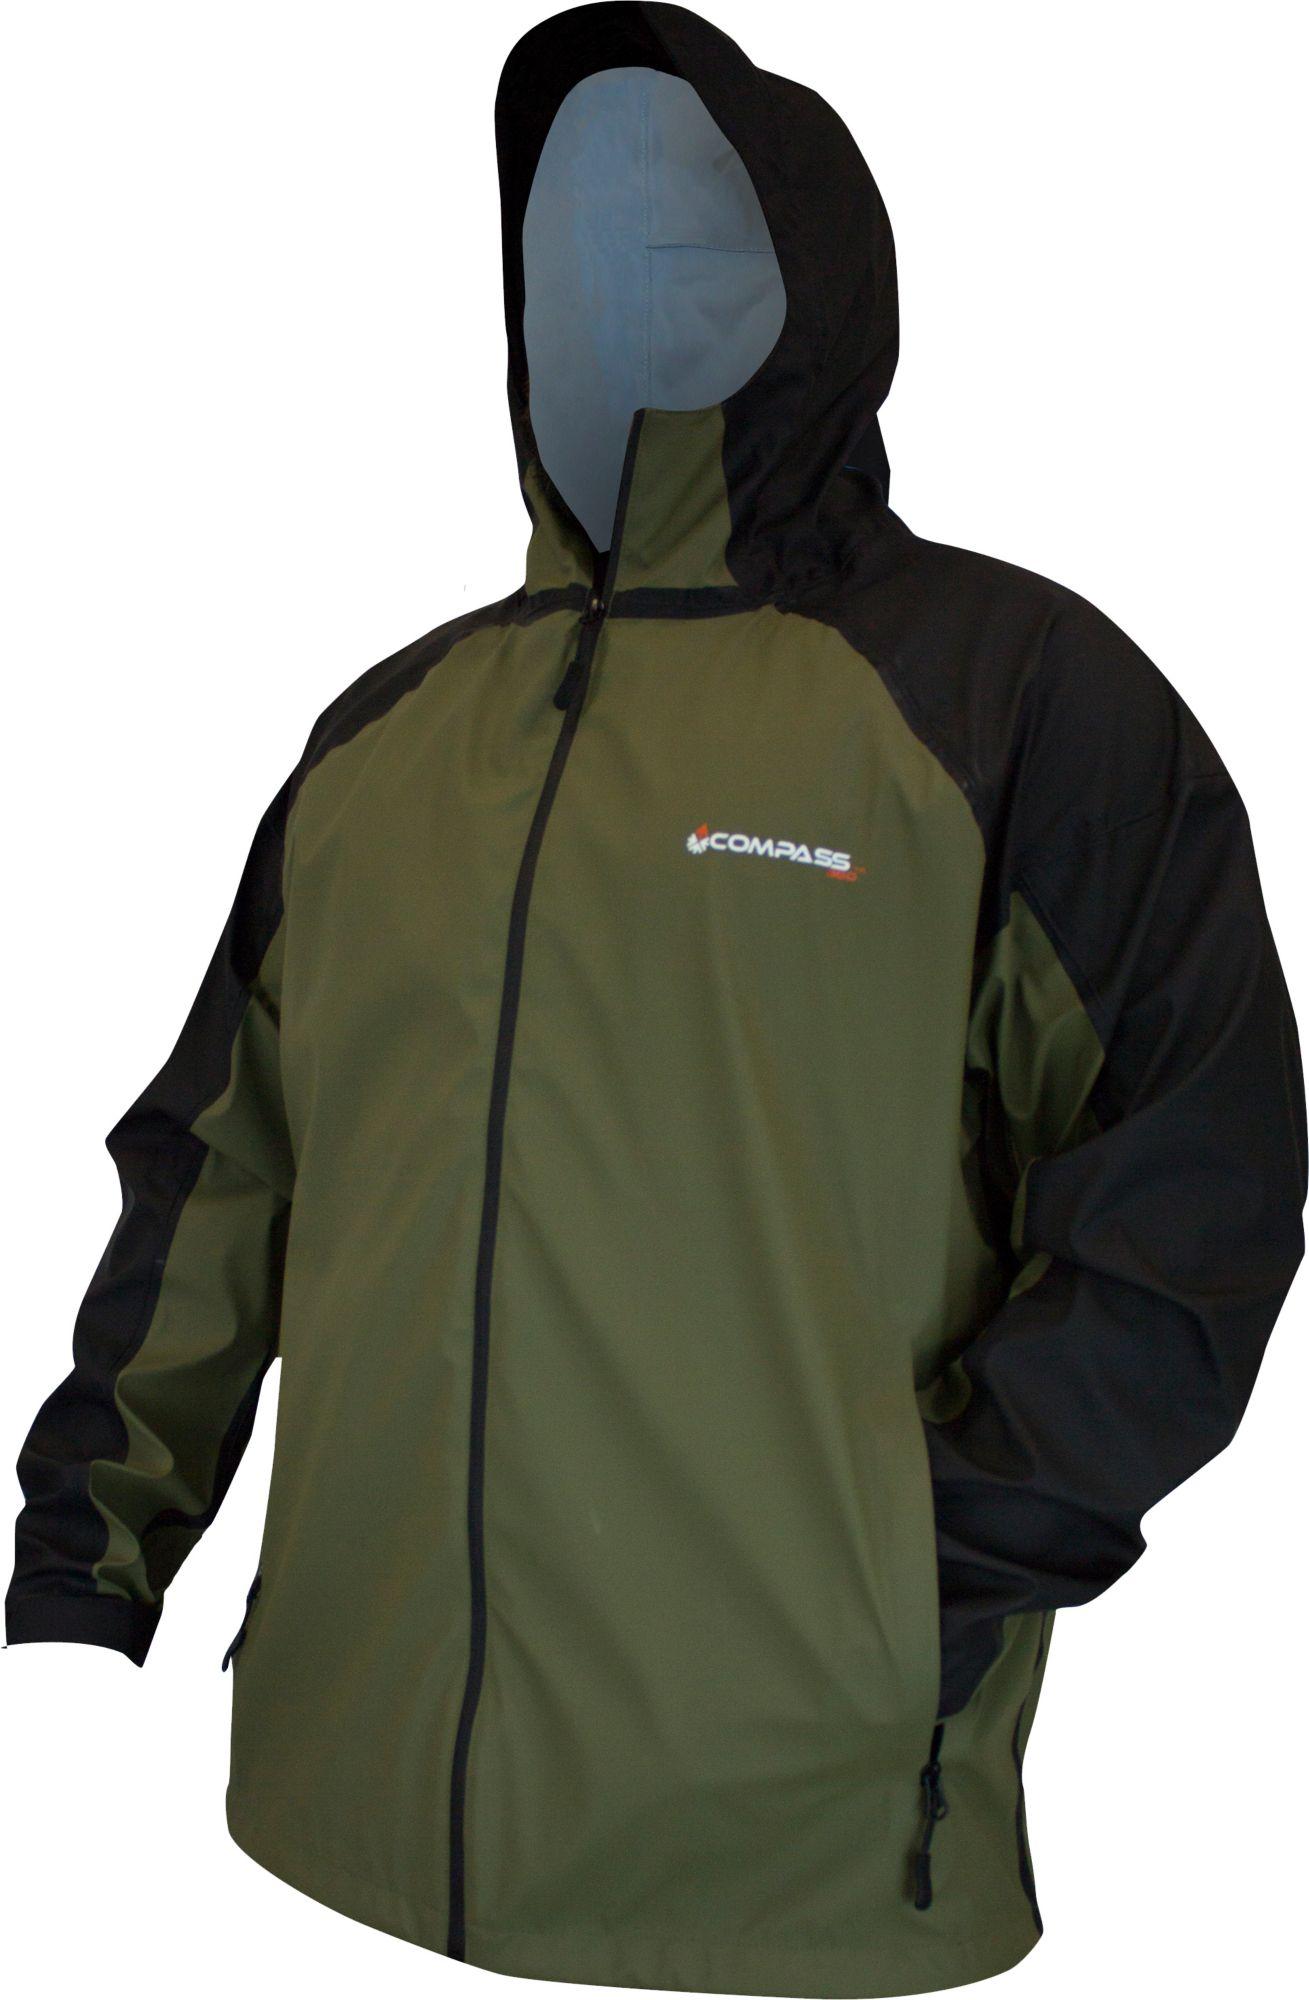 Compass 360 Men's PILOT POINT Jacket, Medium, Black